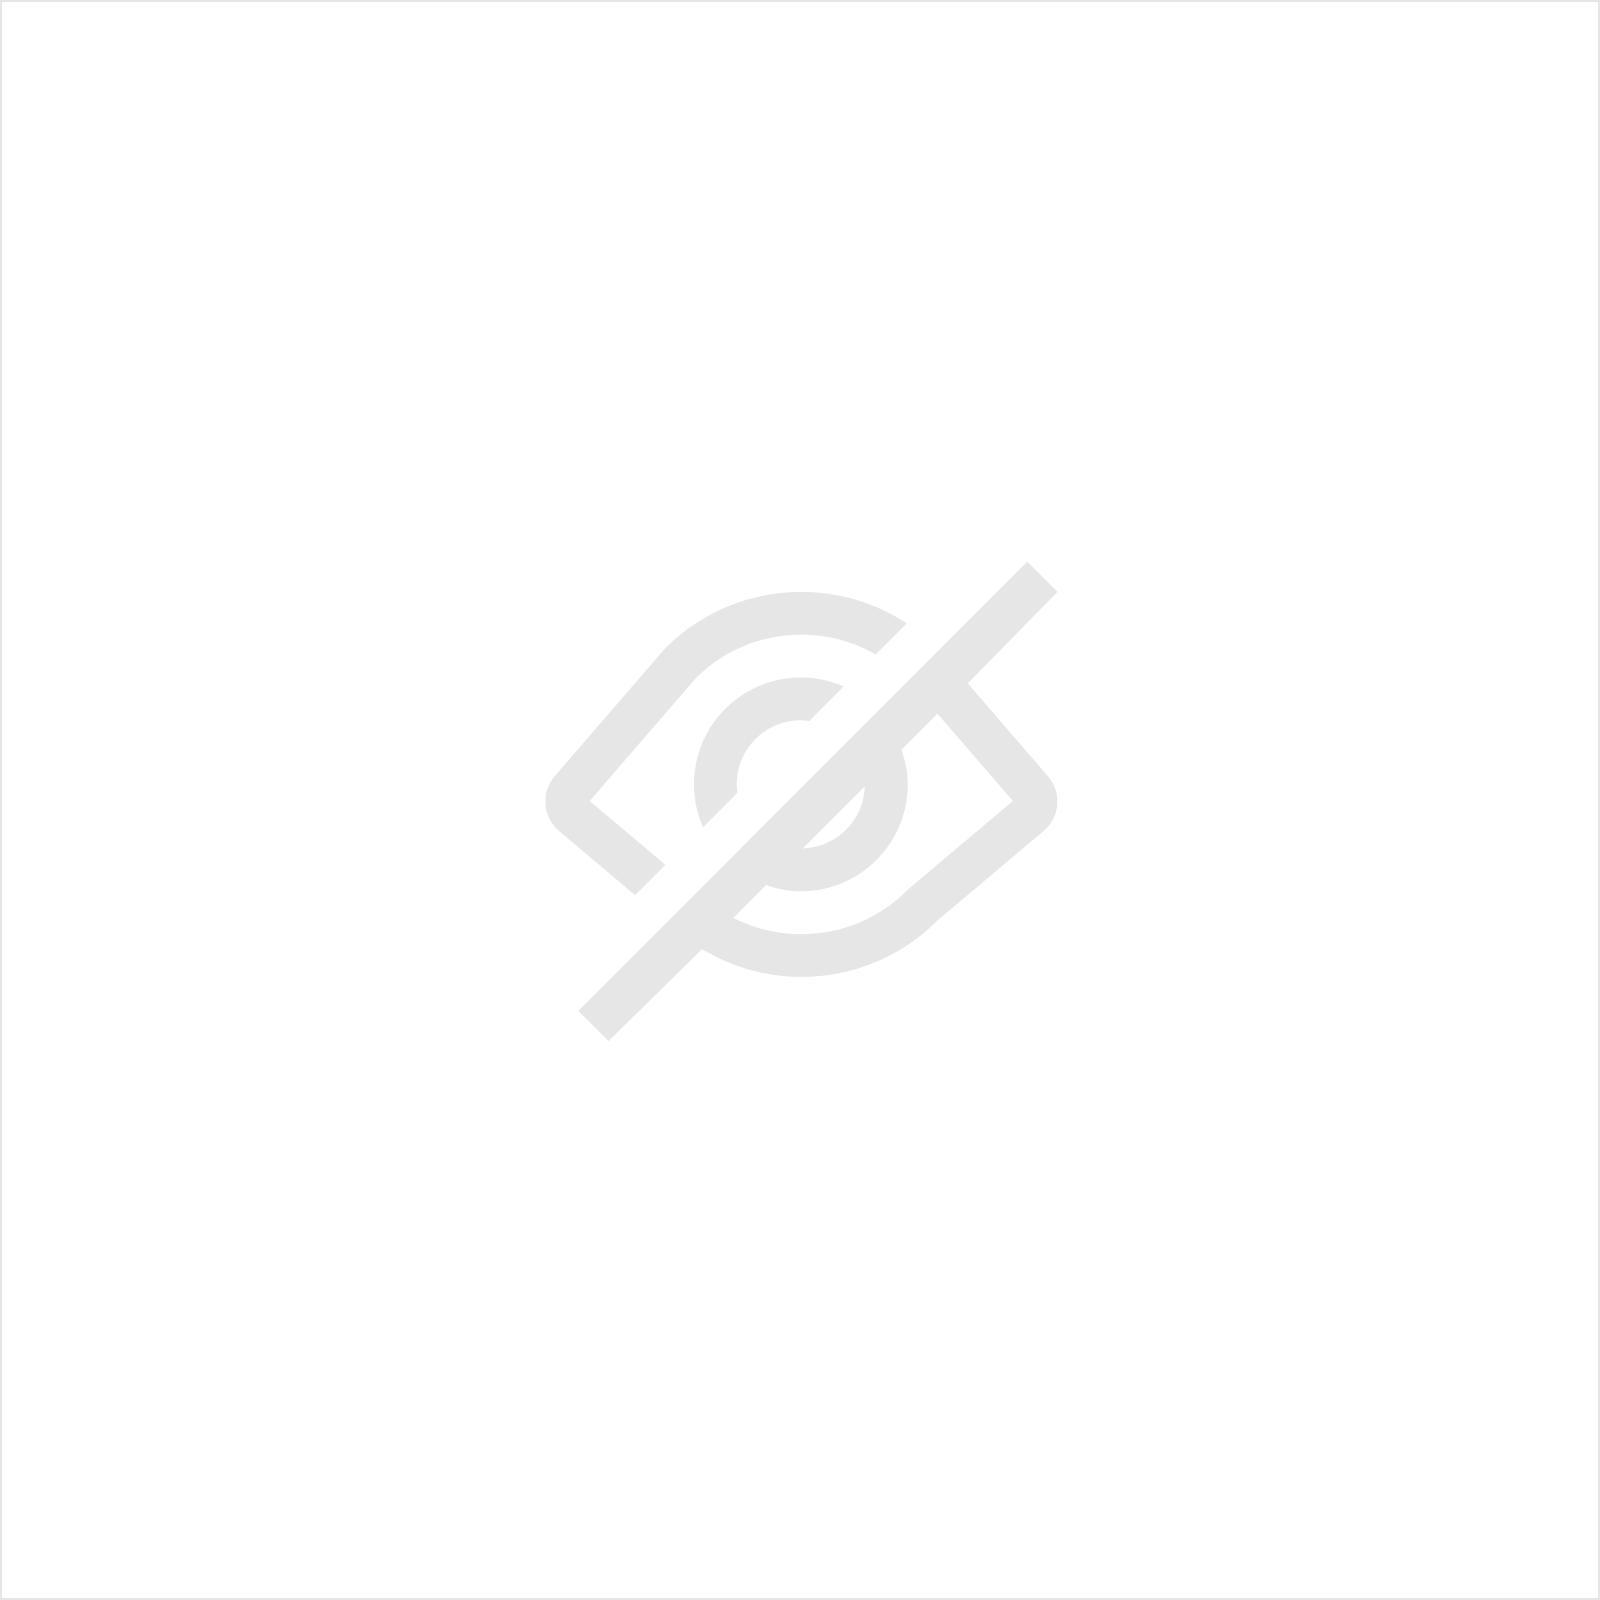 AUTOHOES SUPERTEX LUXE BINNENHOES TYPE F = AUTO < 5,75 M - GROEN